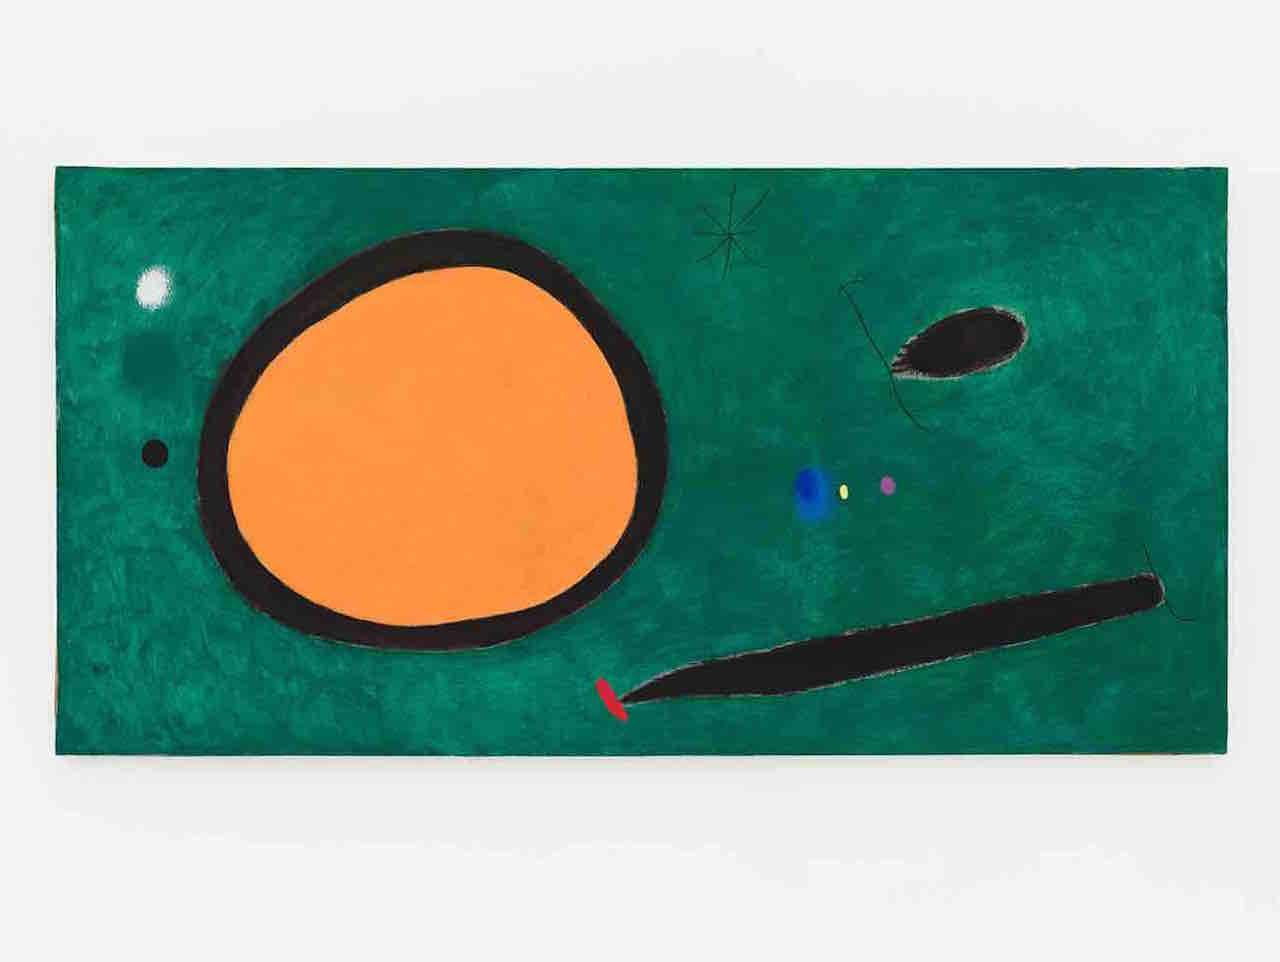 Who Influenced Joan Miro S Paintings